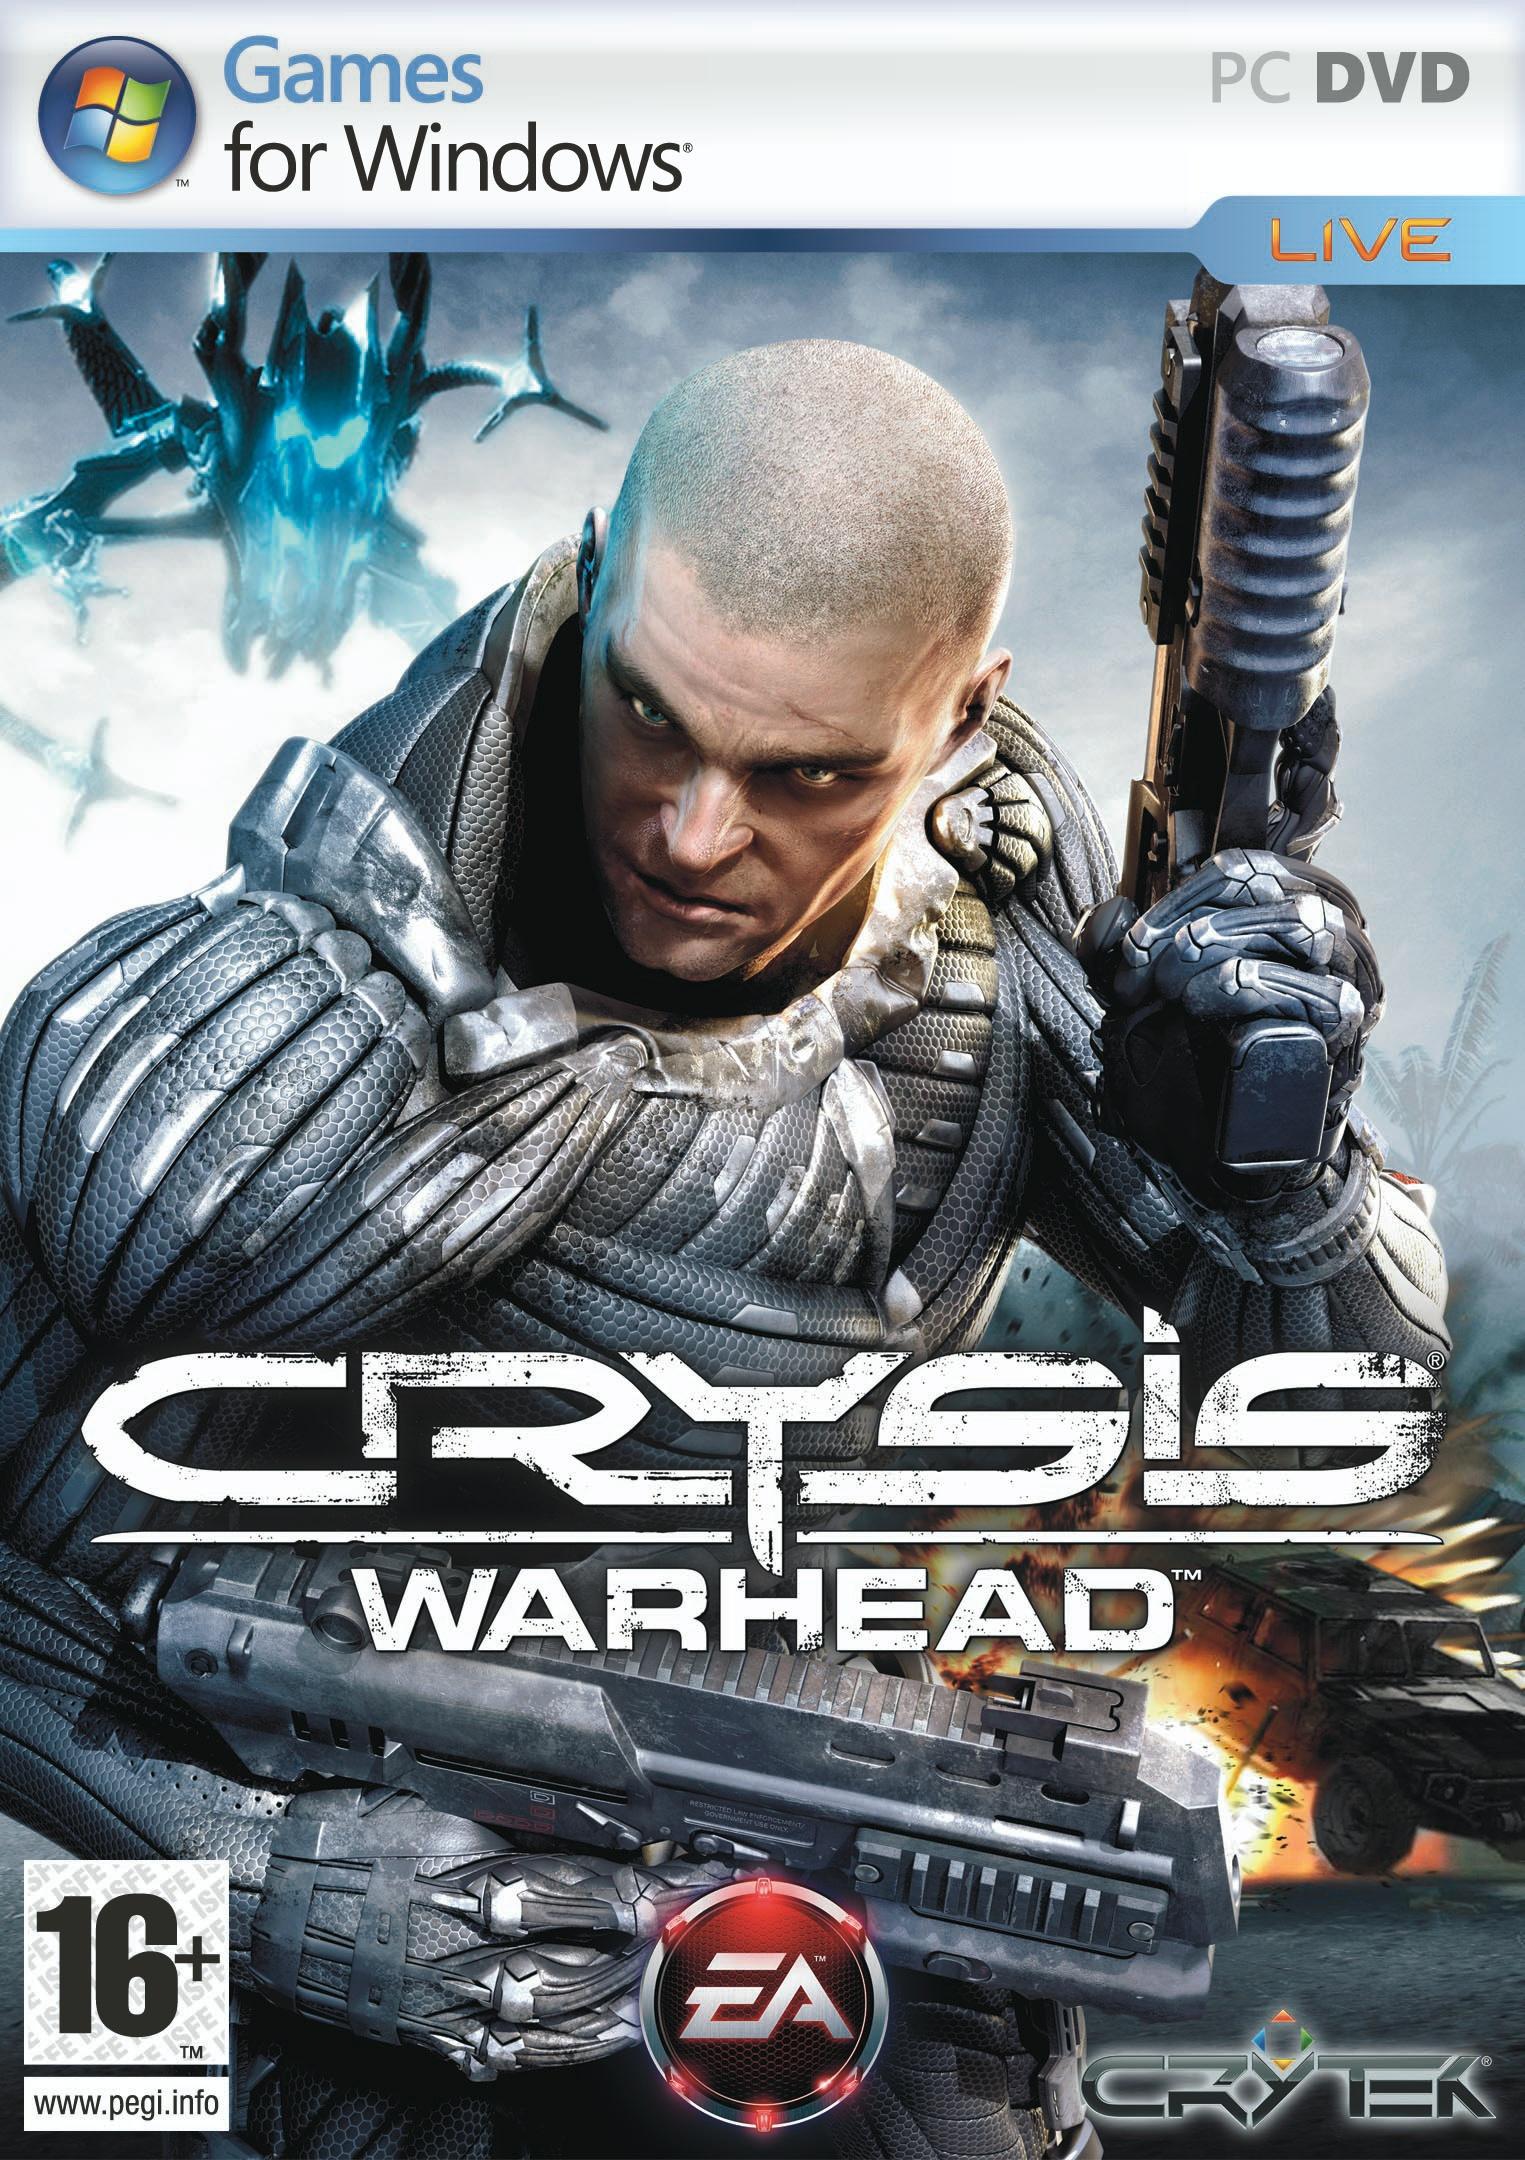 warhead.jpg